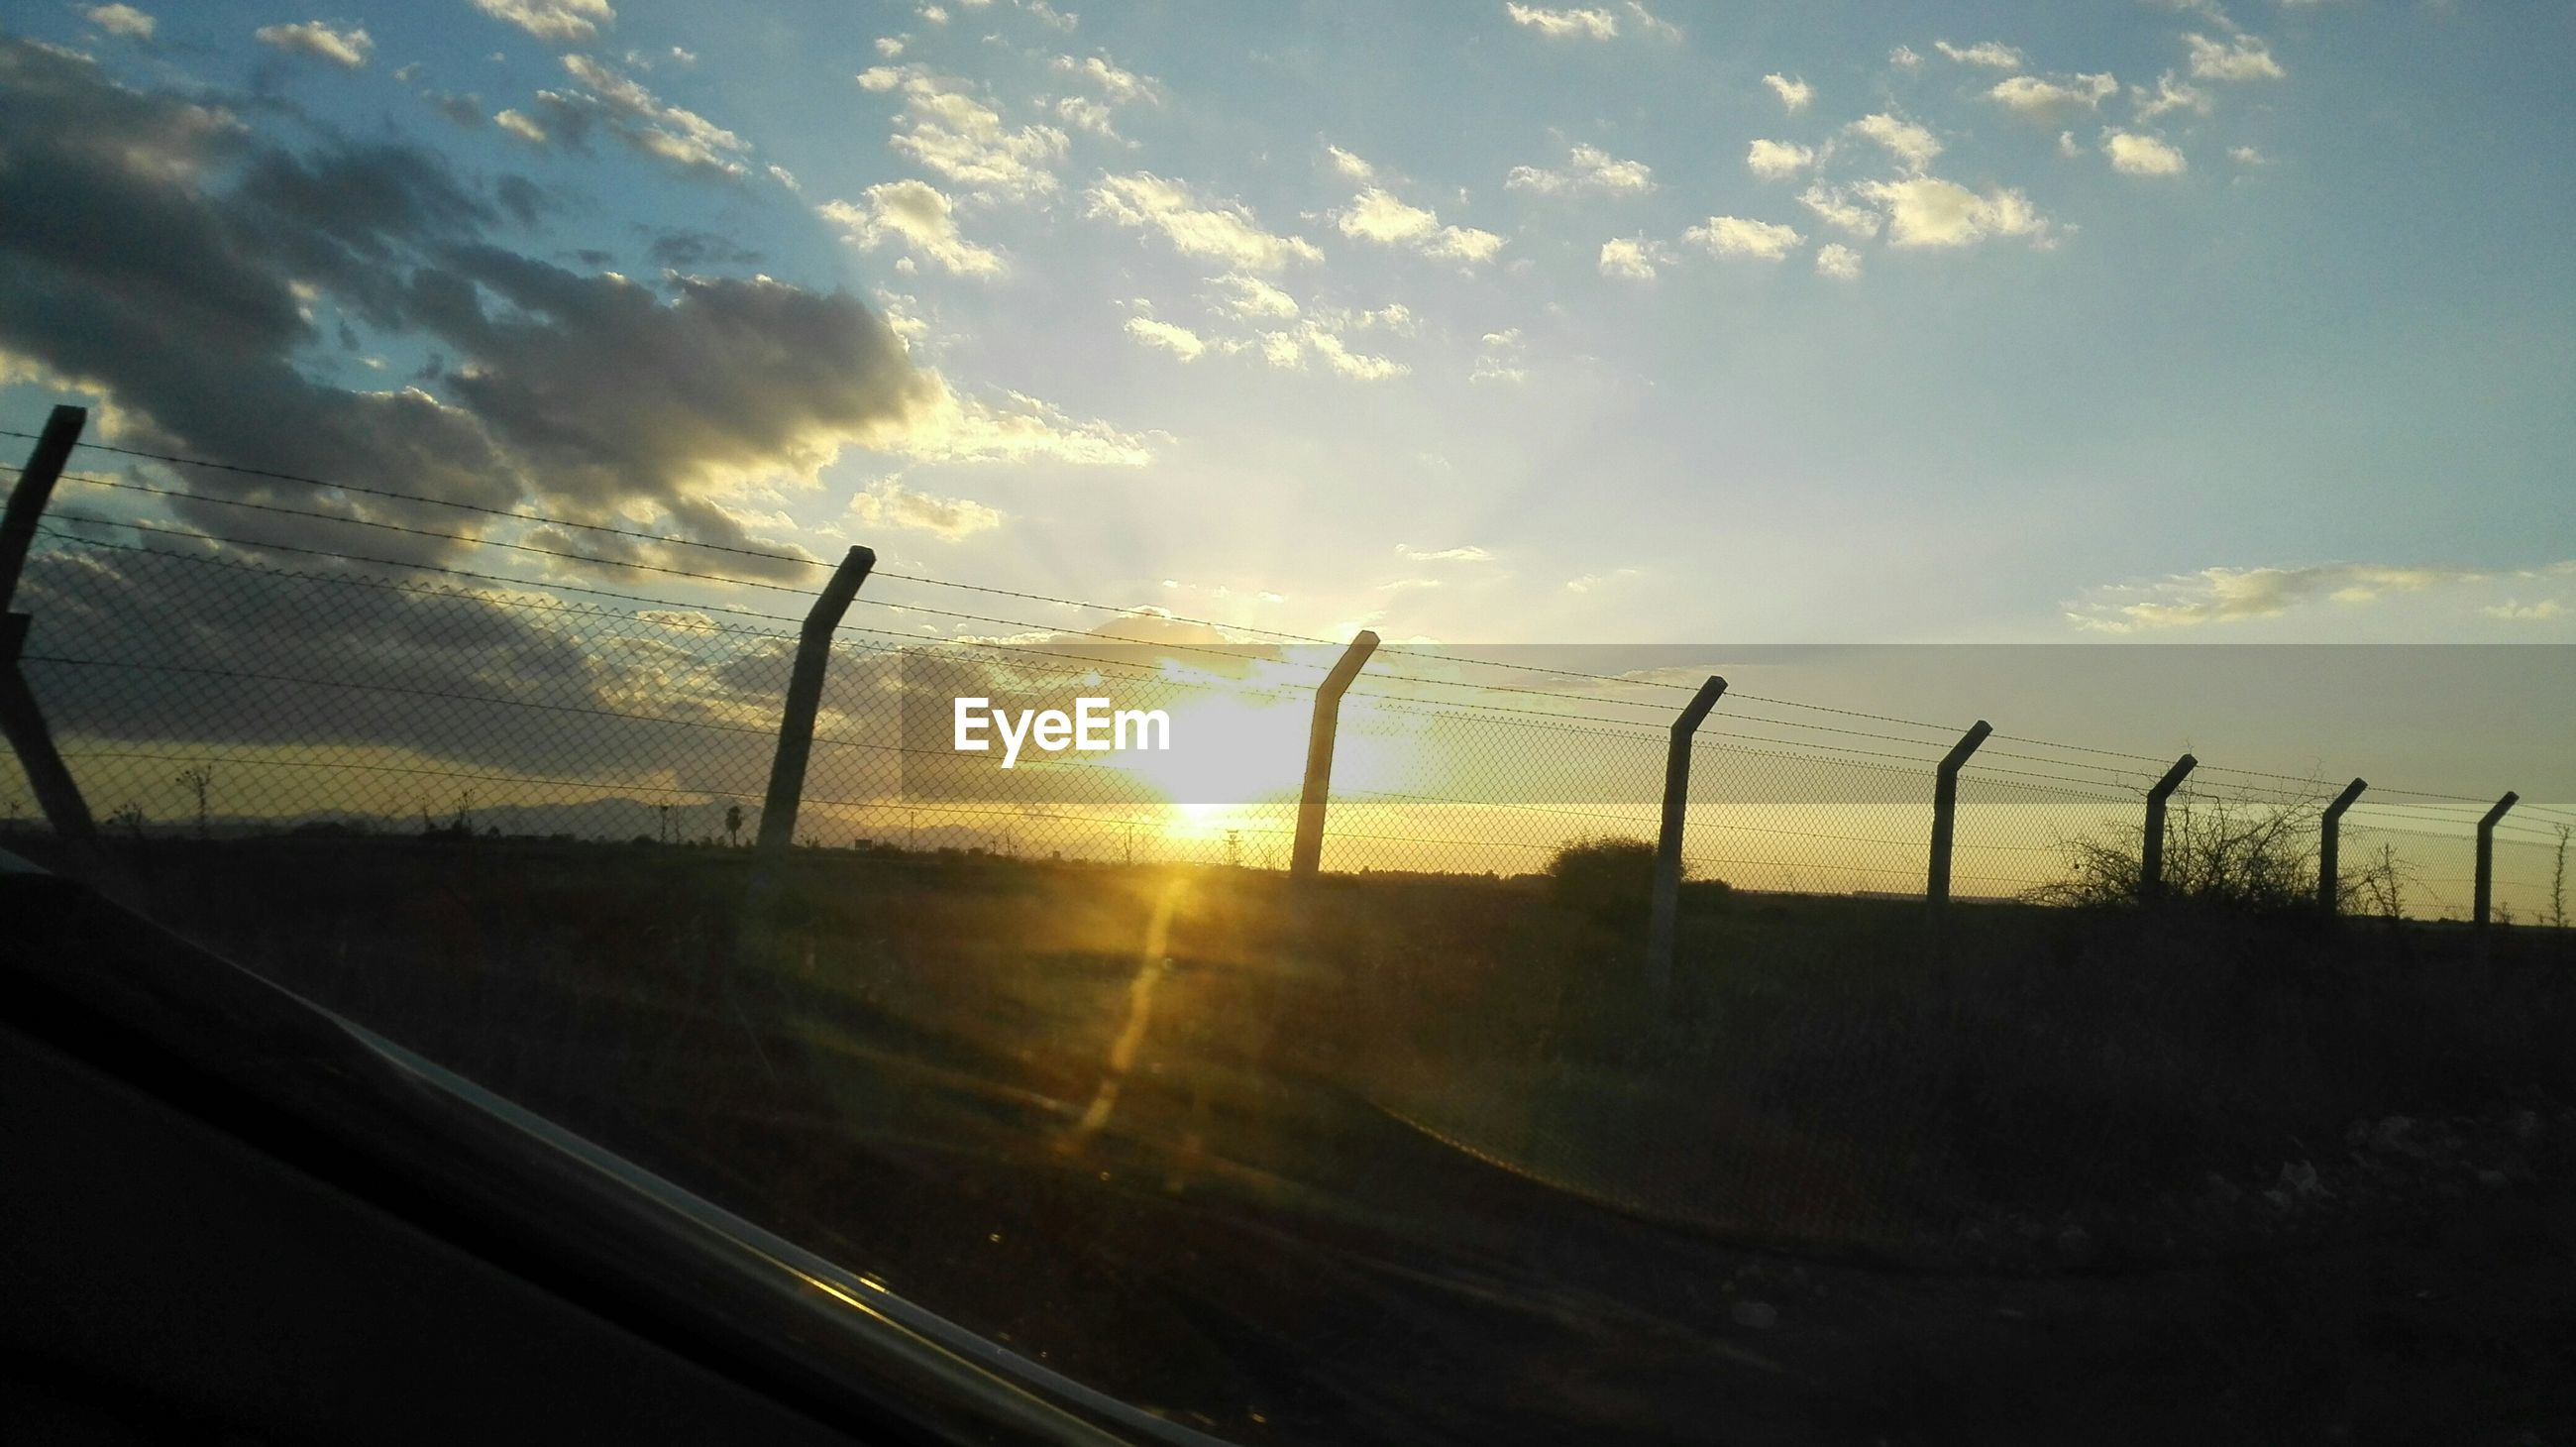 sunset, sun, silhouette, sky, sunlight, scenics, sunbeam, tranquility, lens flare, tranquil scene, orange color, nature, beauty in nature, cloud - sky, fence, idyllic, landscape, back lit, outdoors, no people